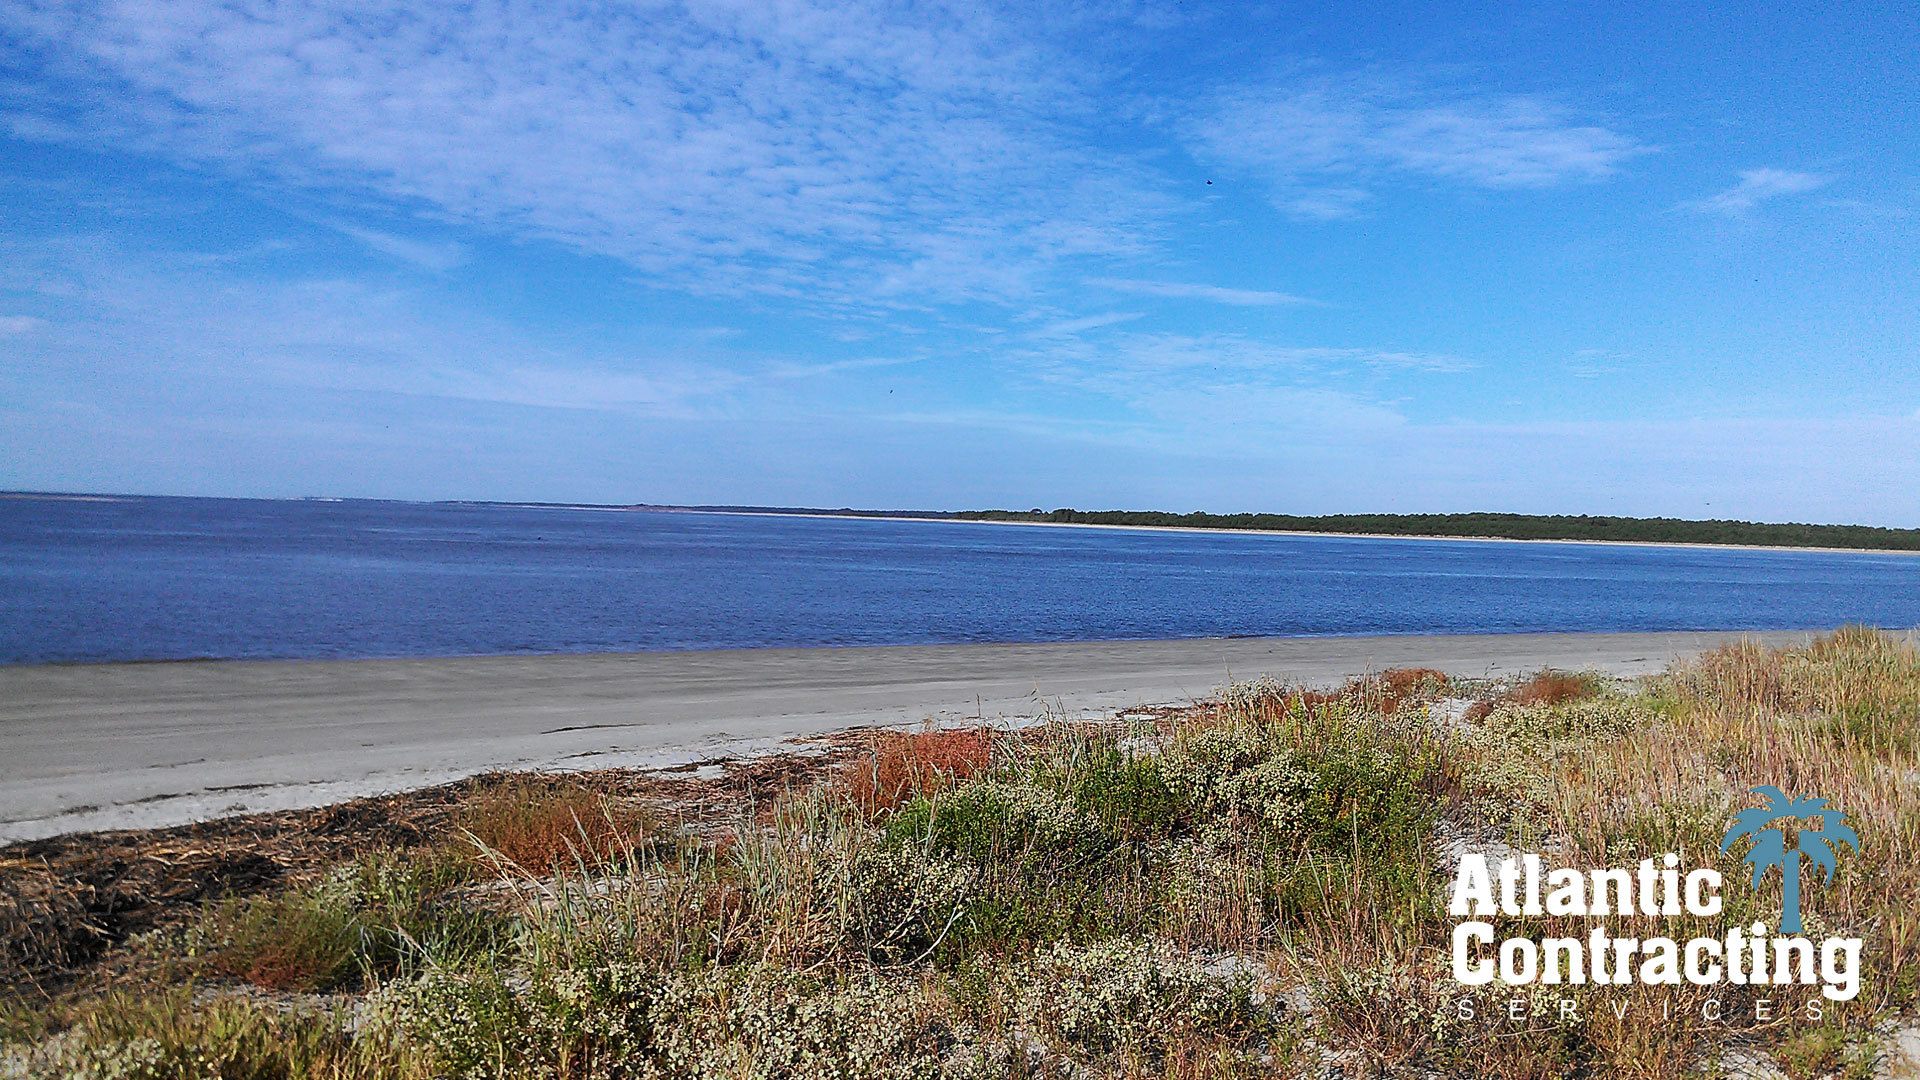 Atlantic Contracting Services Serving Coastal Carolina